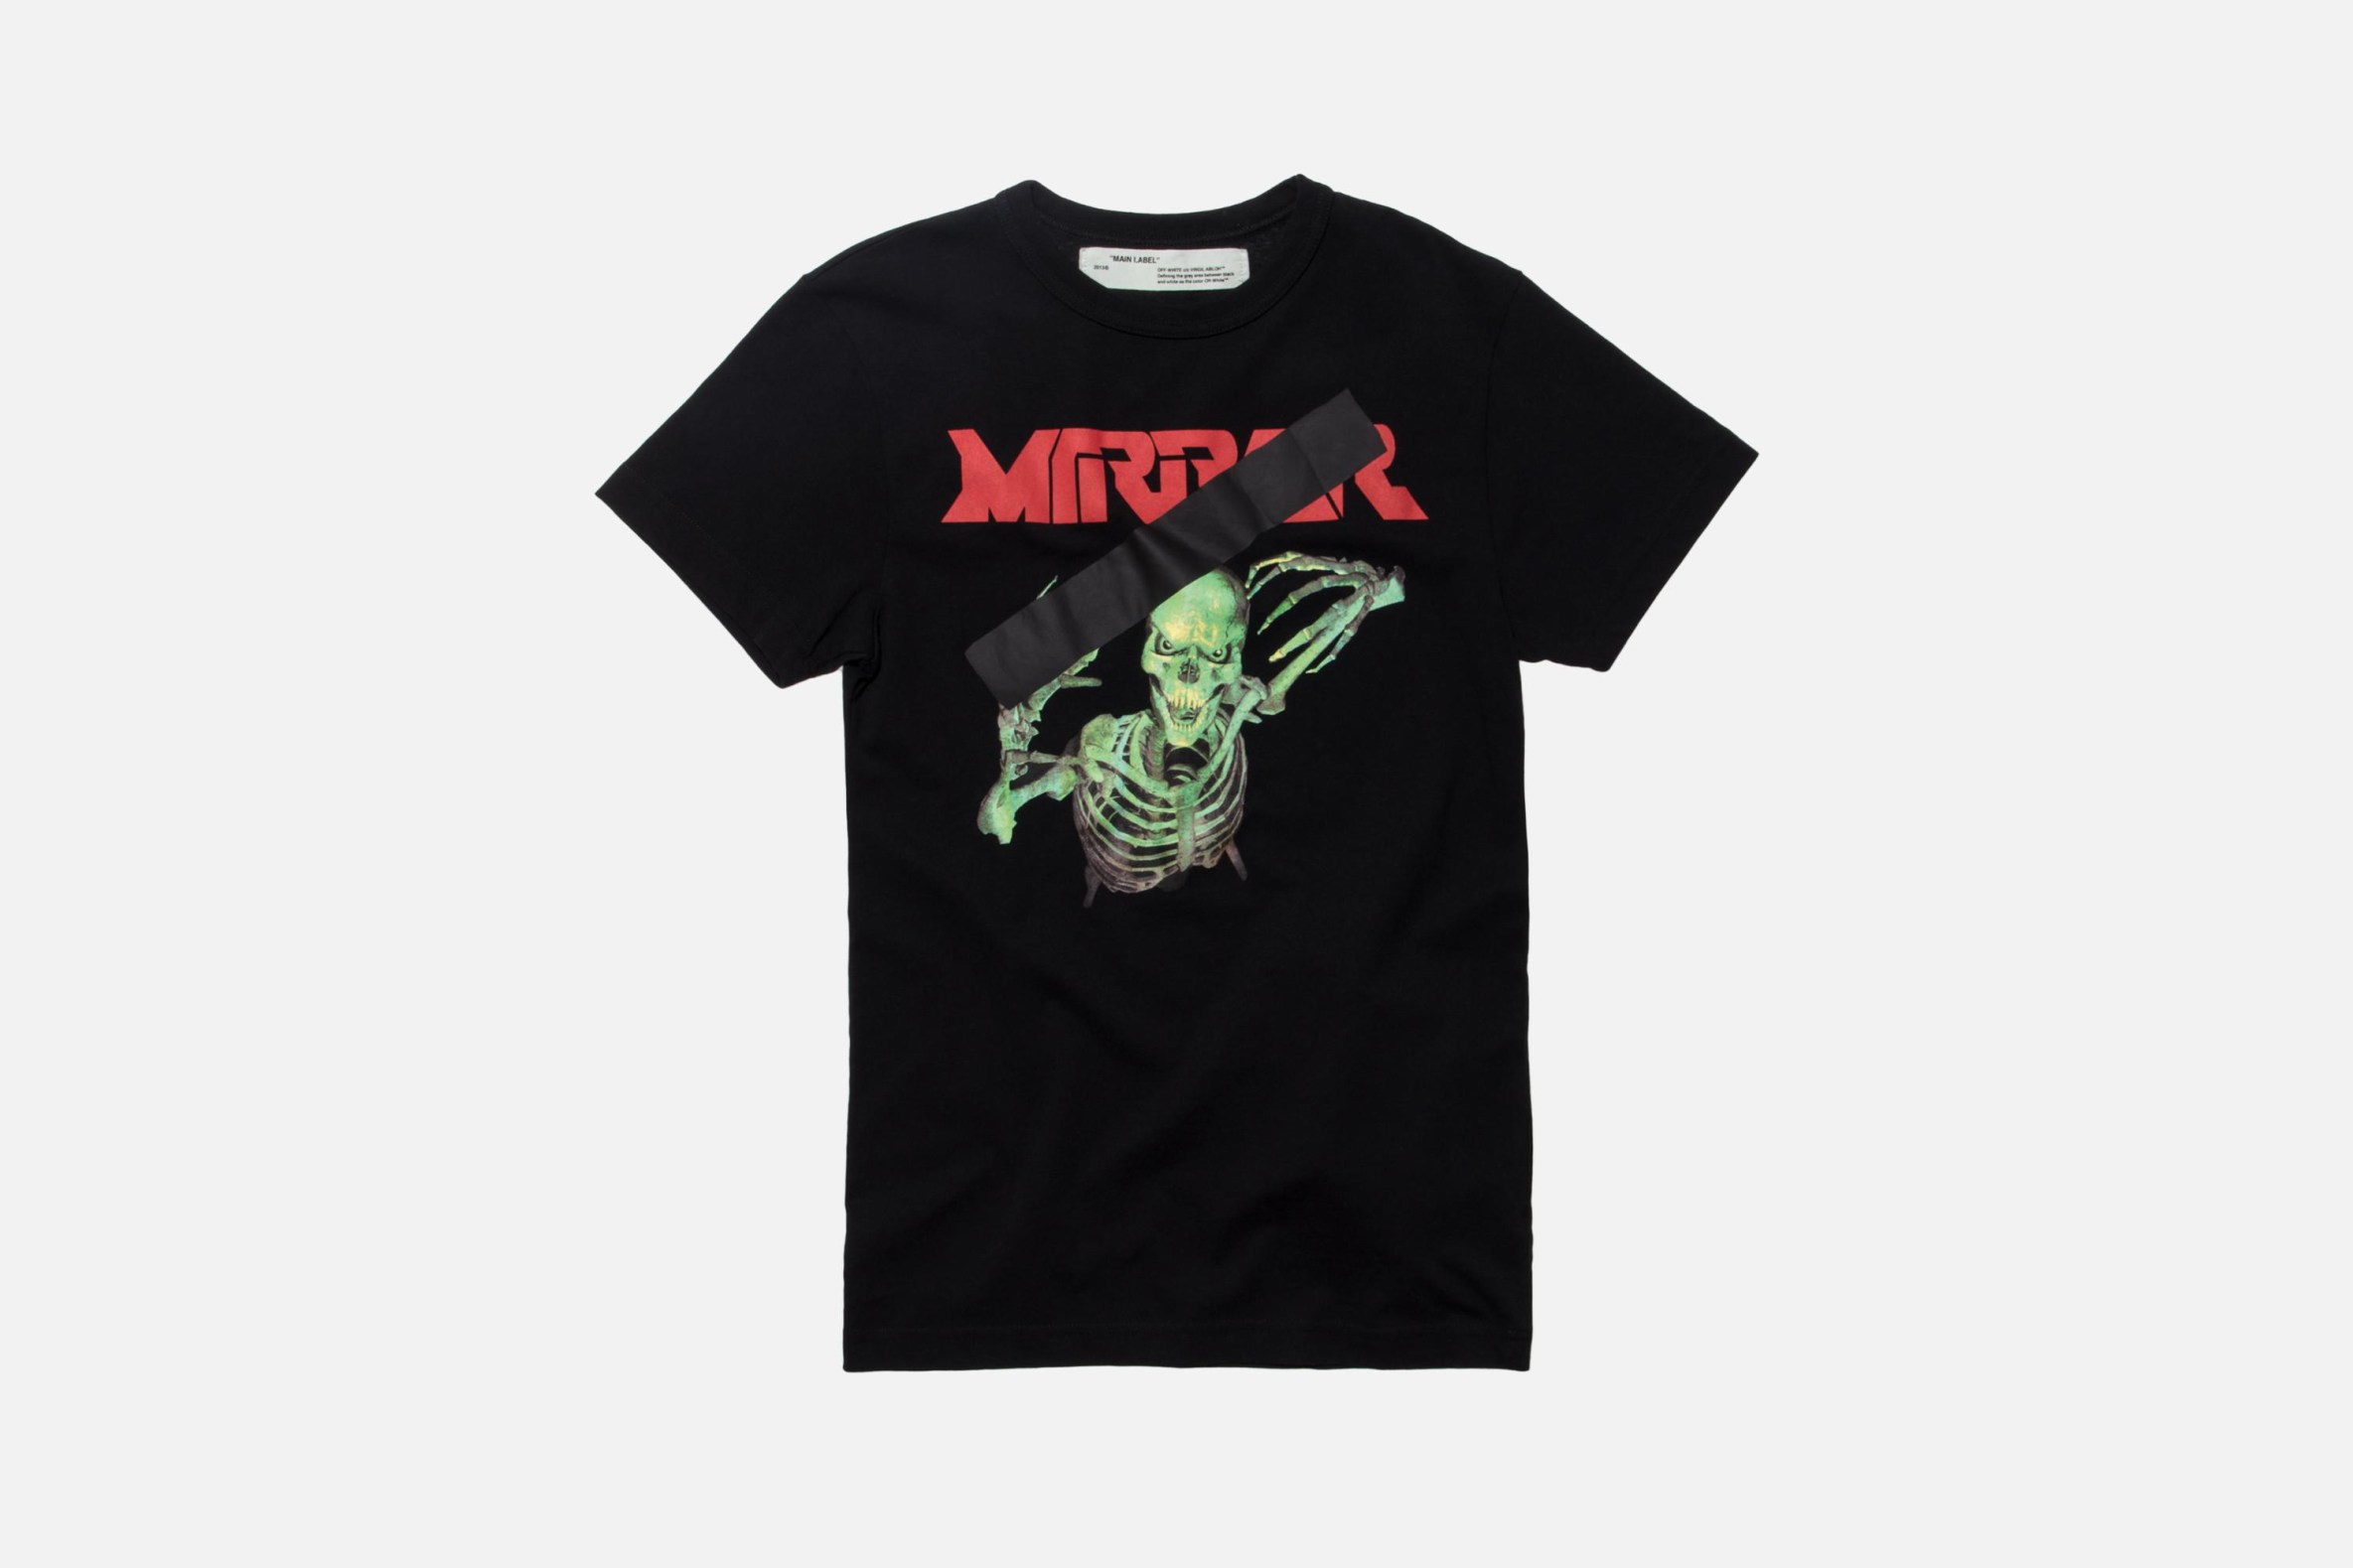 off-white-mirror-mirror-t-shirts-buy-now-3